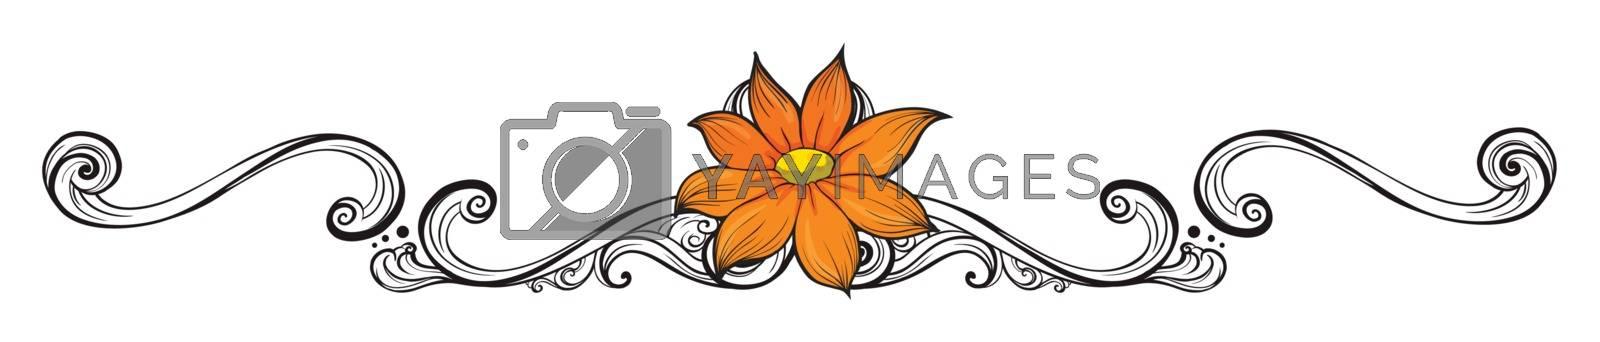 Illustration of an orange flower border on a white background